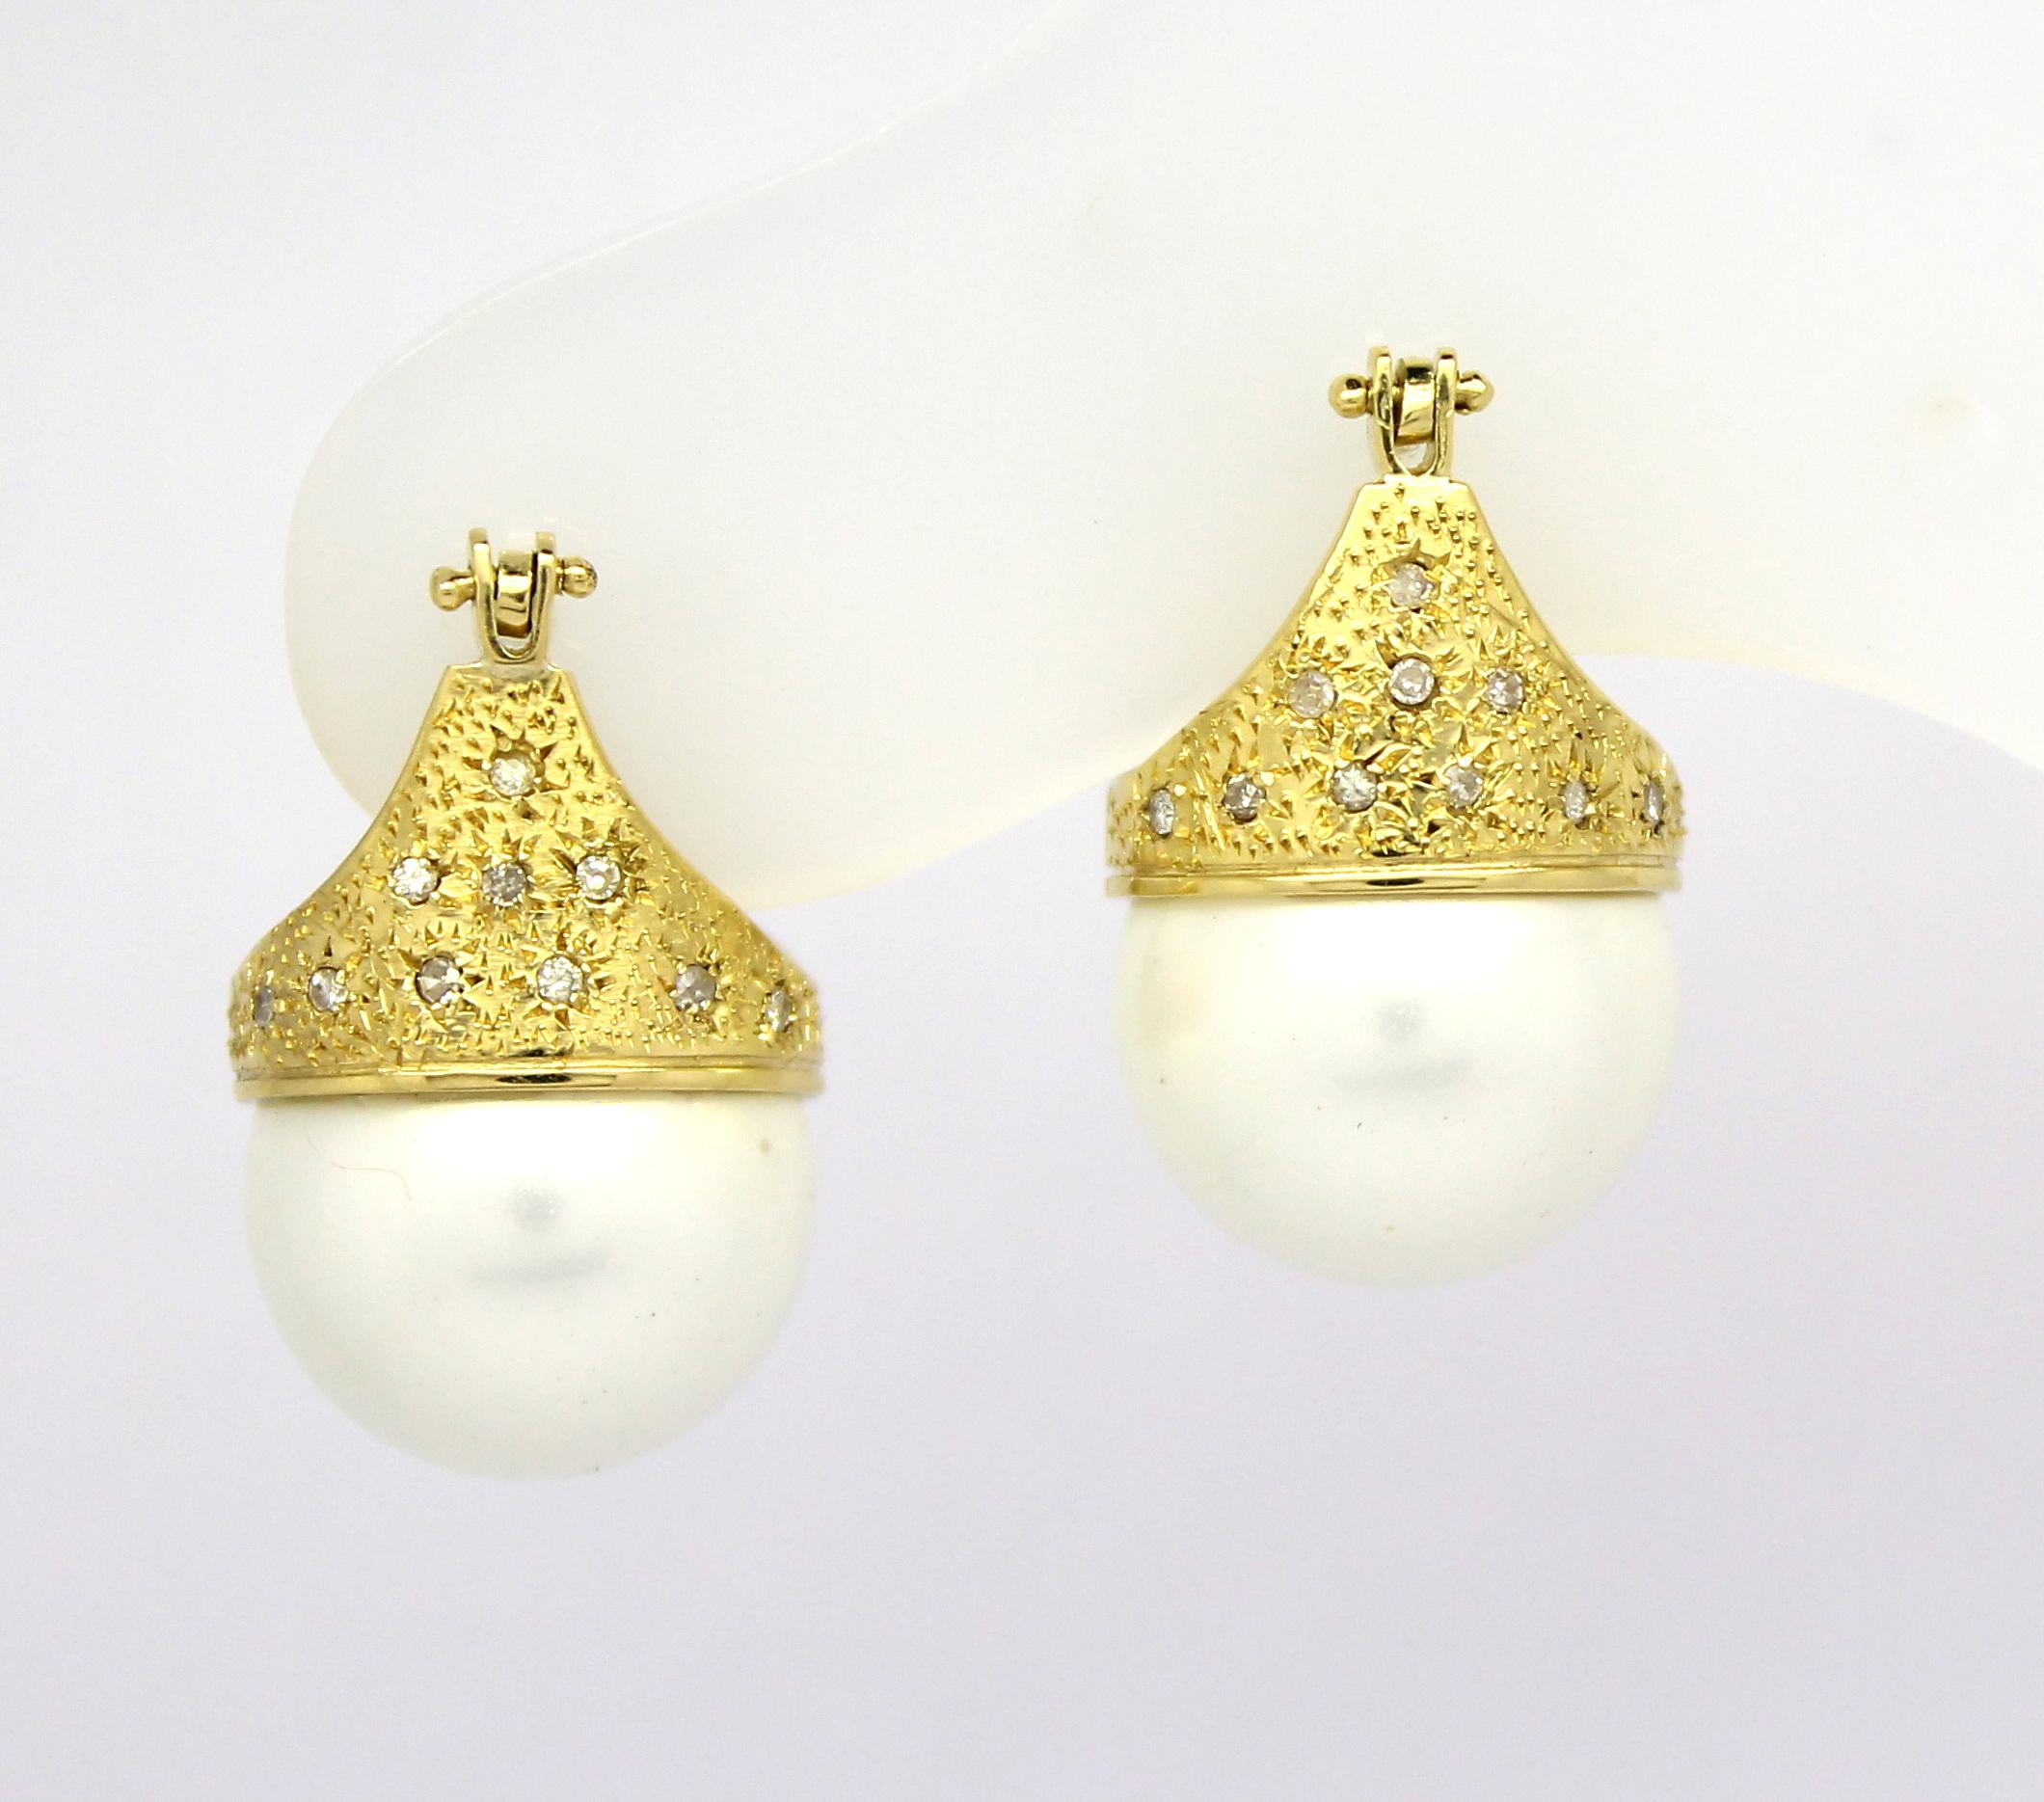 4407c2688f564 Brinco Lady Di Diamantes Ouro Amarelo 18k 750 - Marcio Joalheiros ...